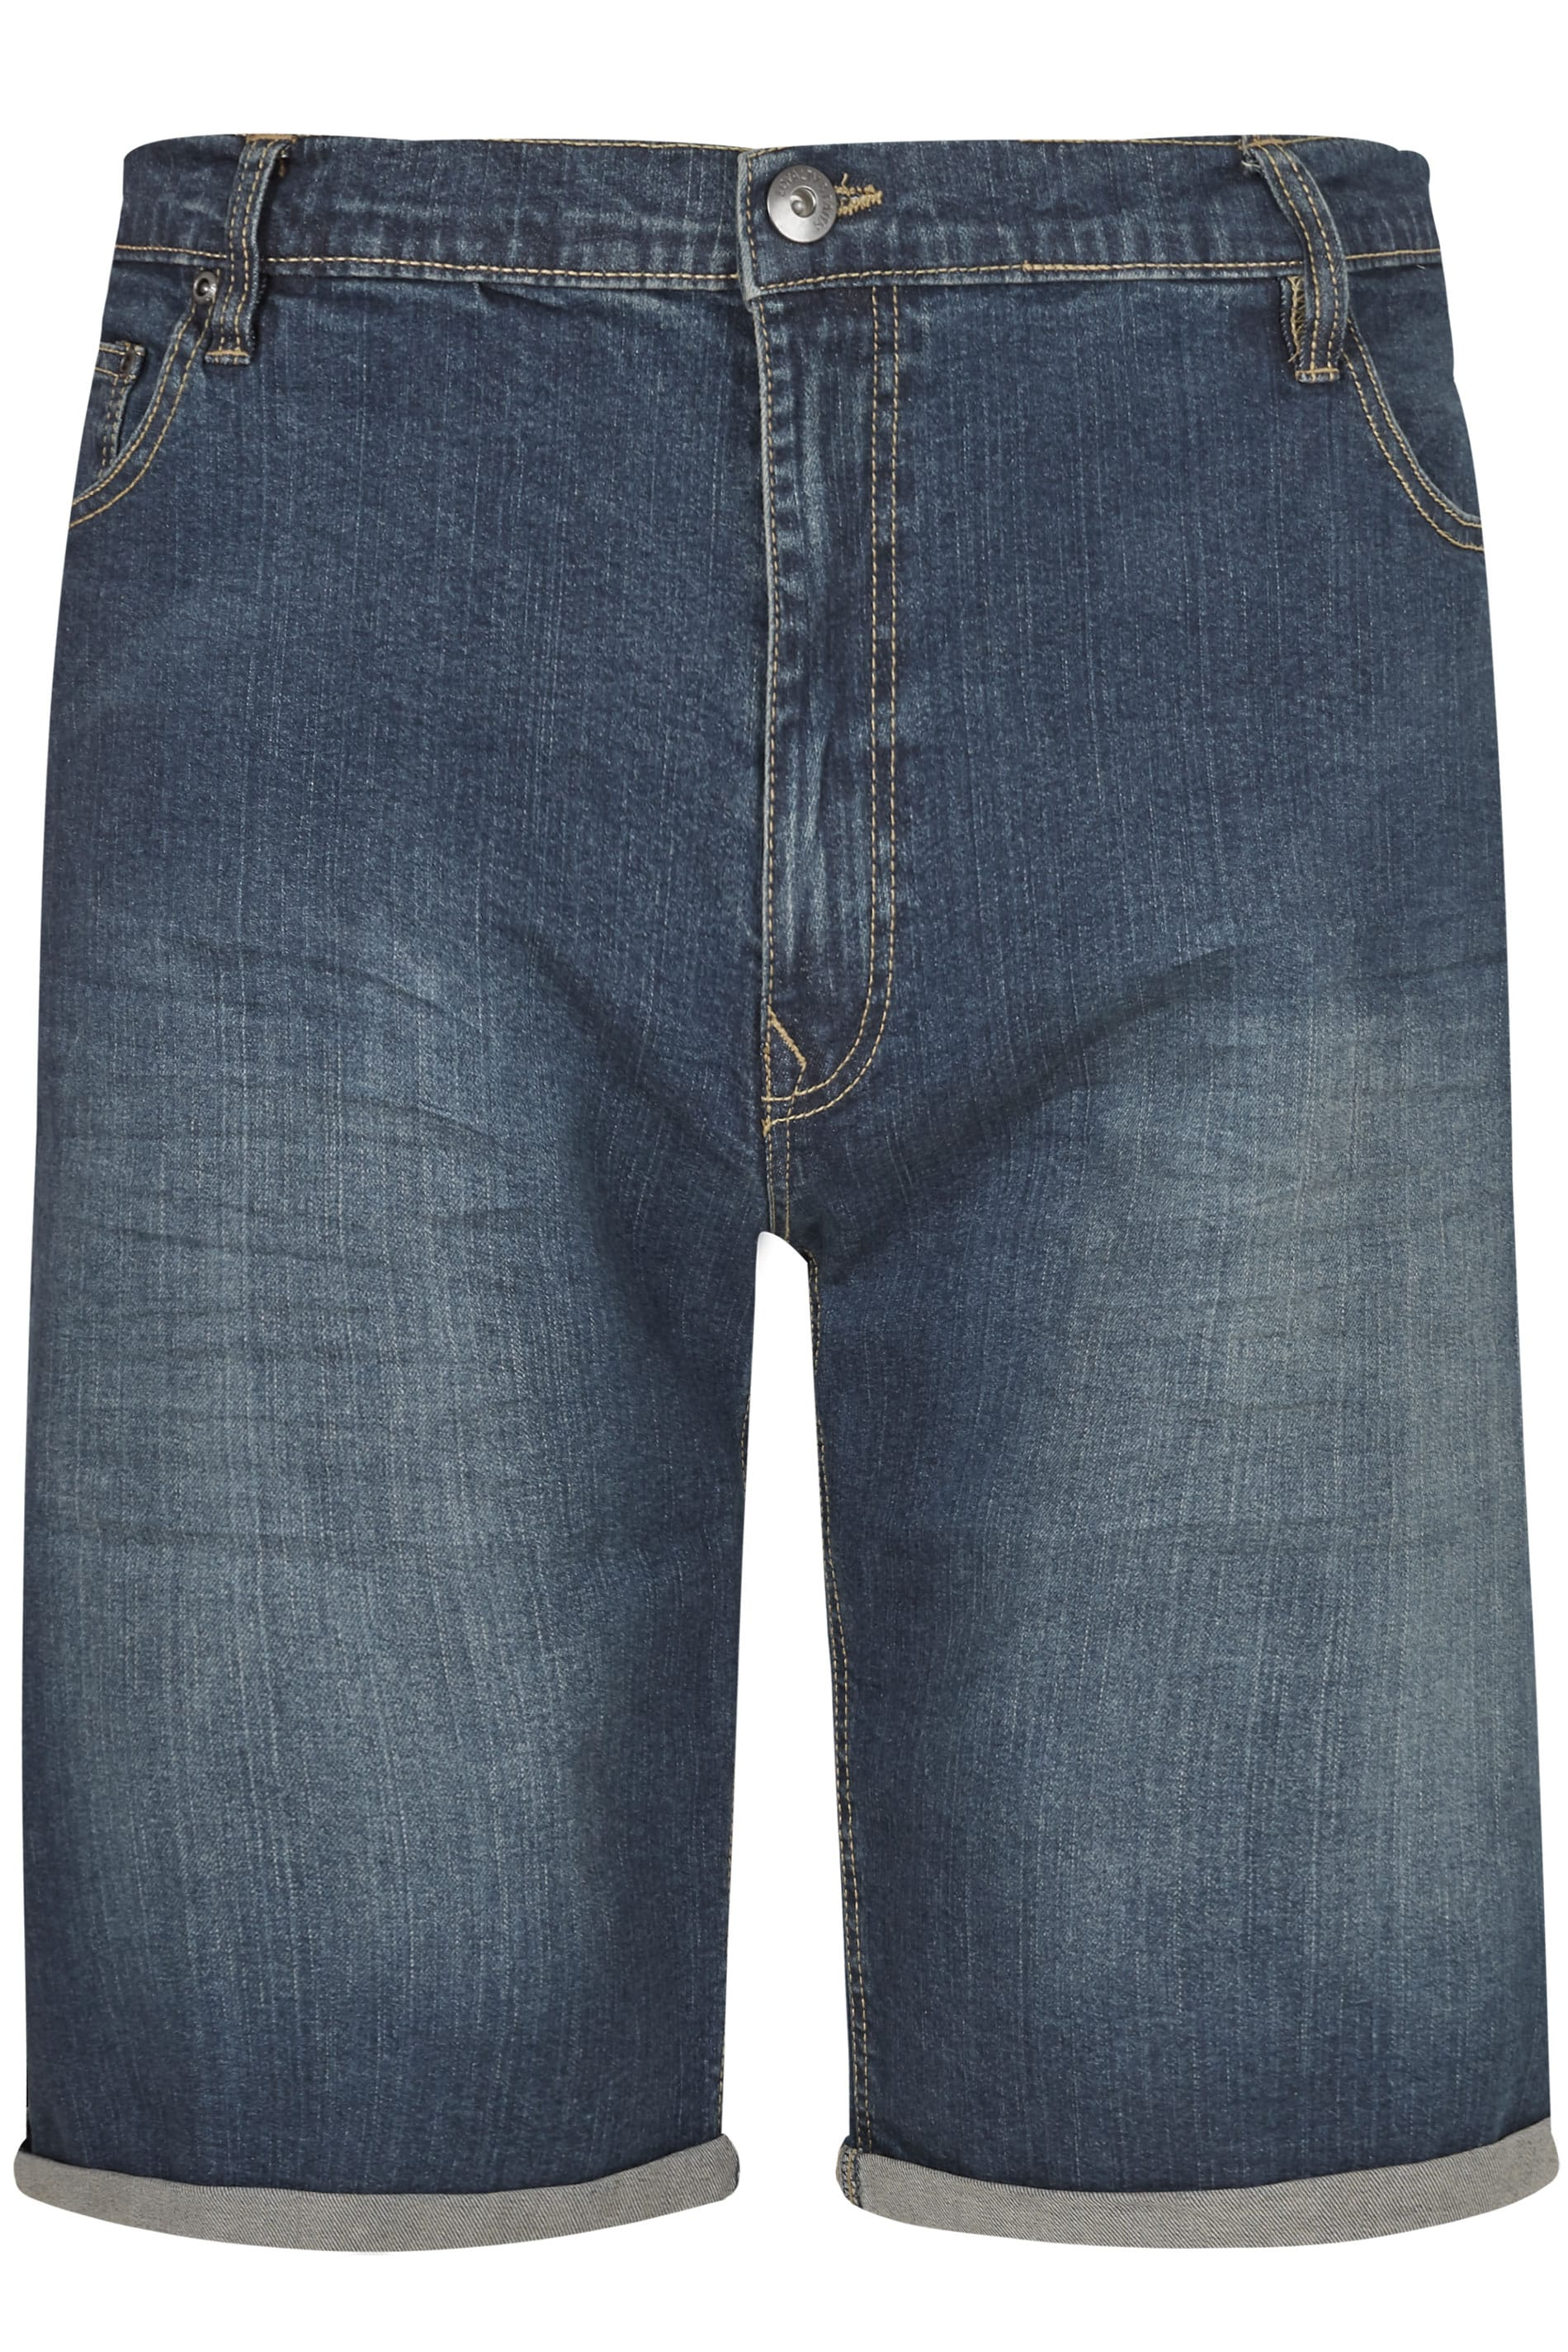 LOYALTY & FAITH Dark Blue Mid Wash Straight Leg Shorts